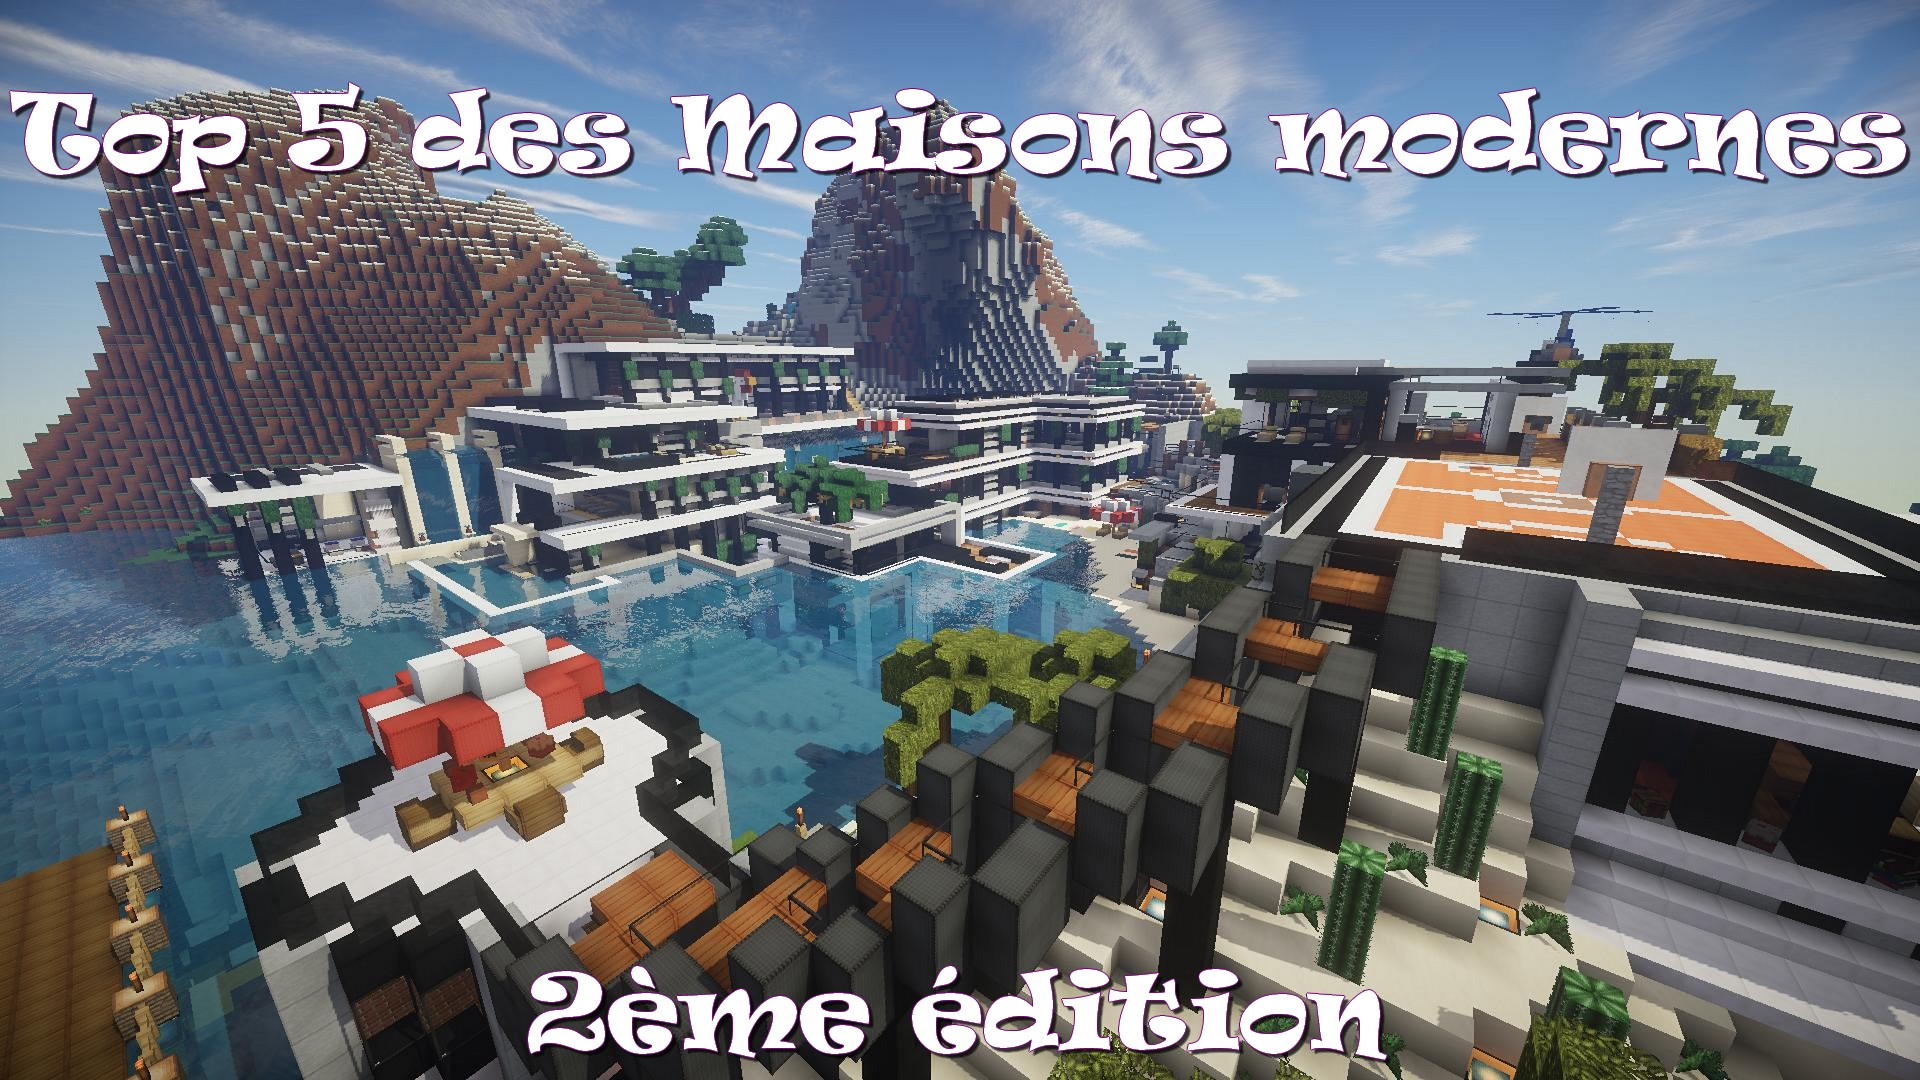 Top 5 des maisons modernes minecraft : Minecraft-aventure.com